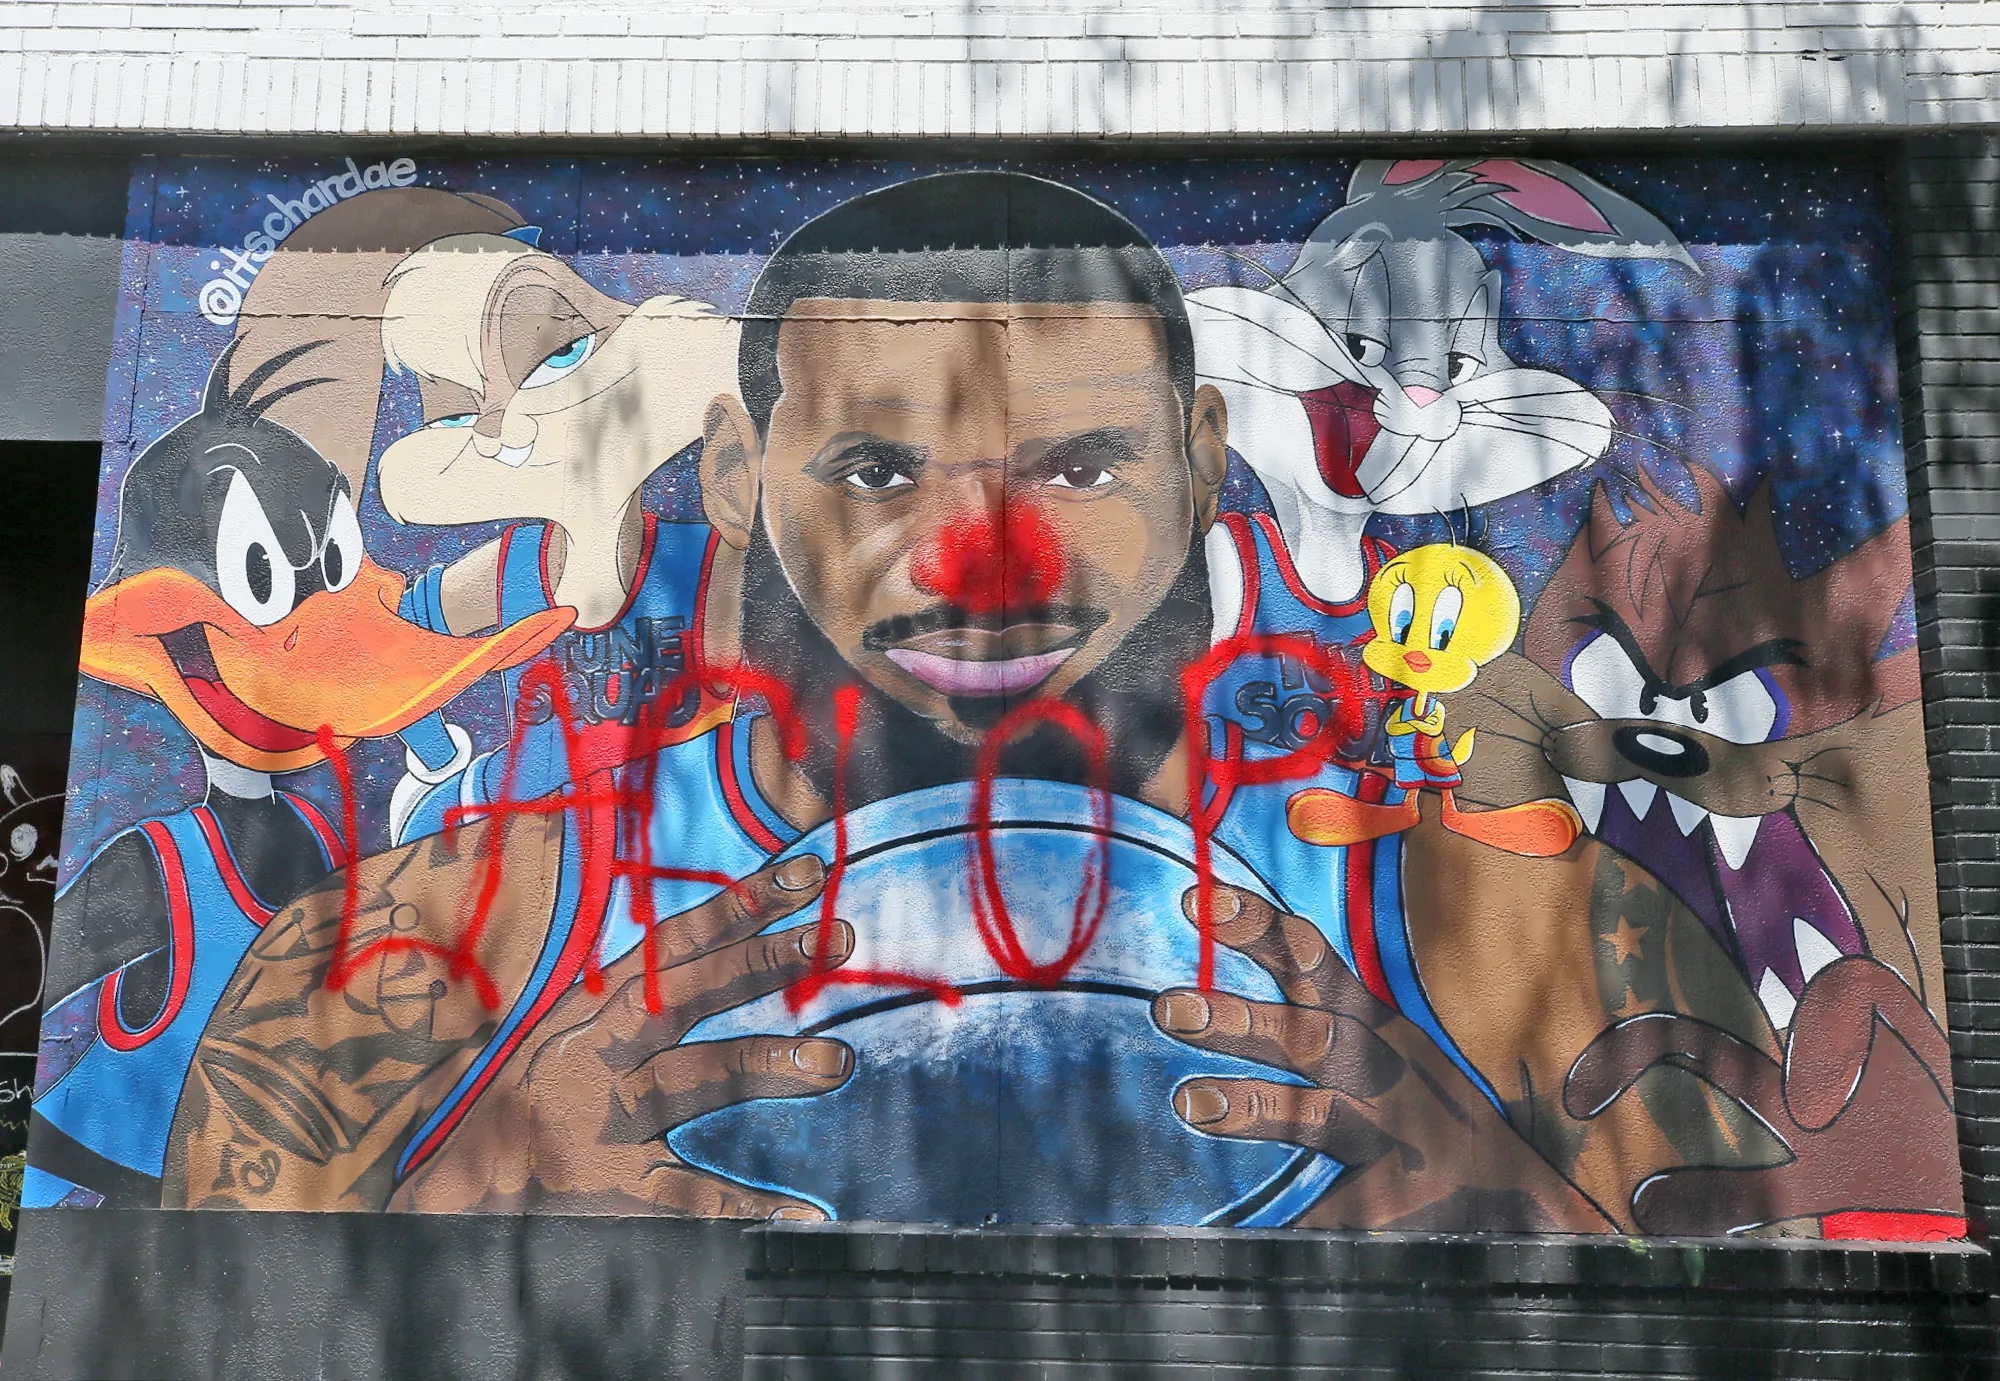 LeBron James Space Jam Mural Vandalized